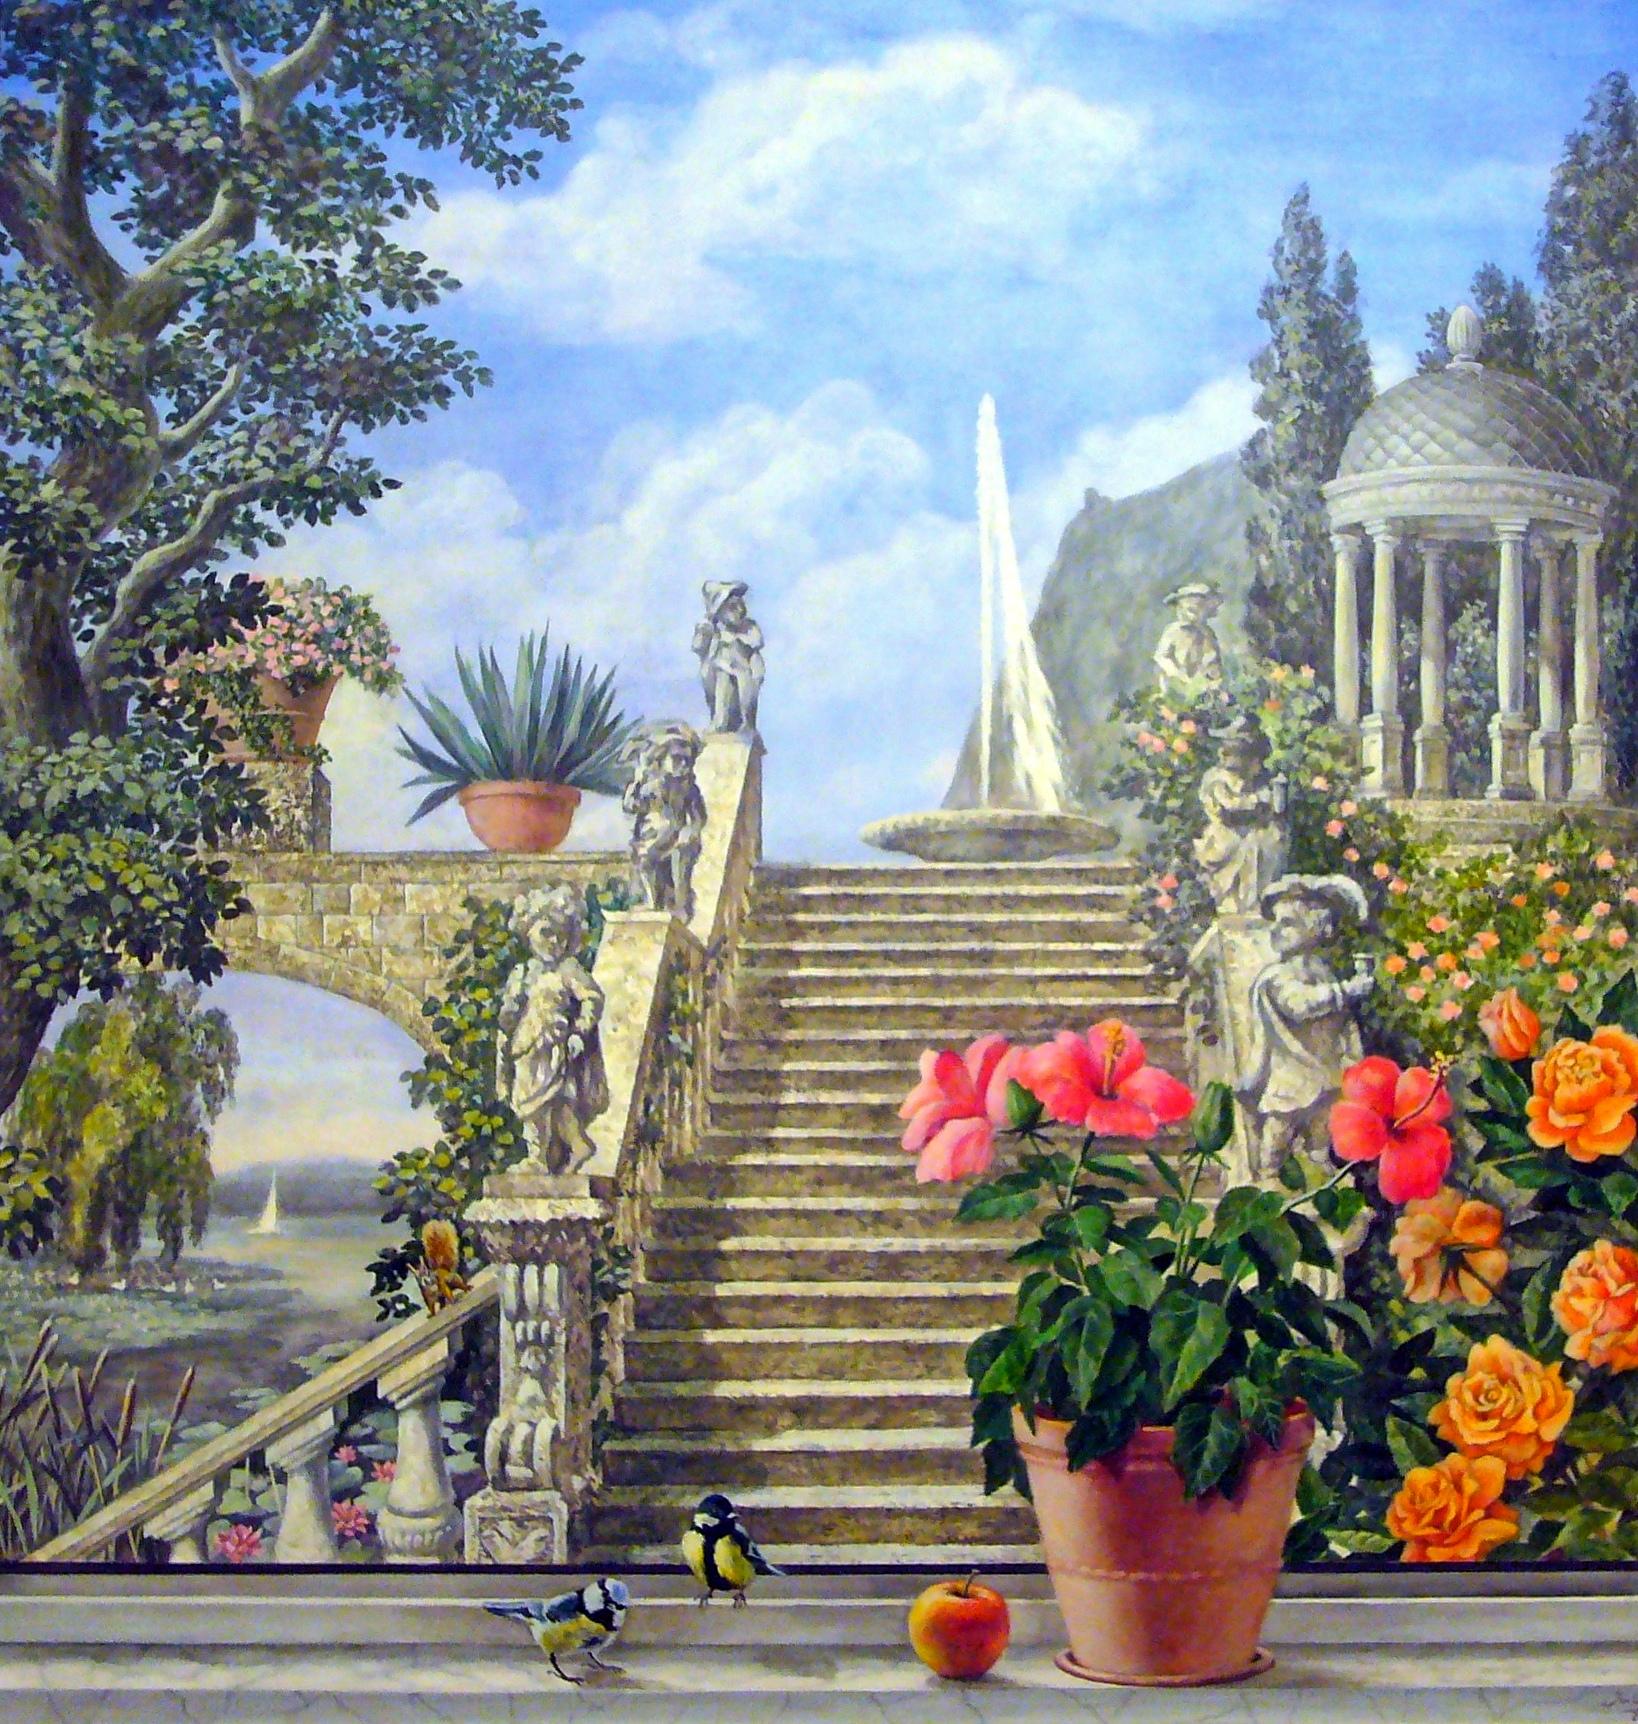 Juliyart fensterausblick zum italienischen park 2012 - Wandmalerei berlin ...